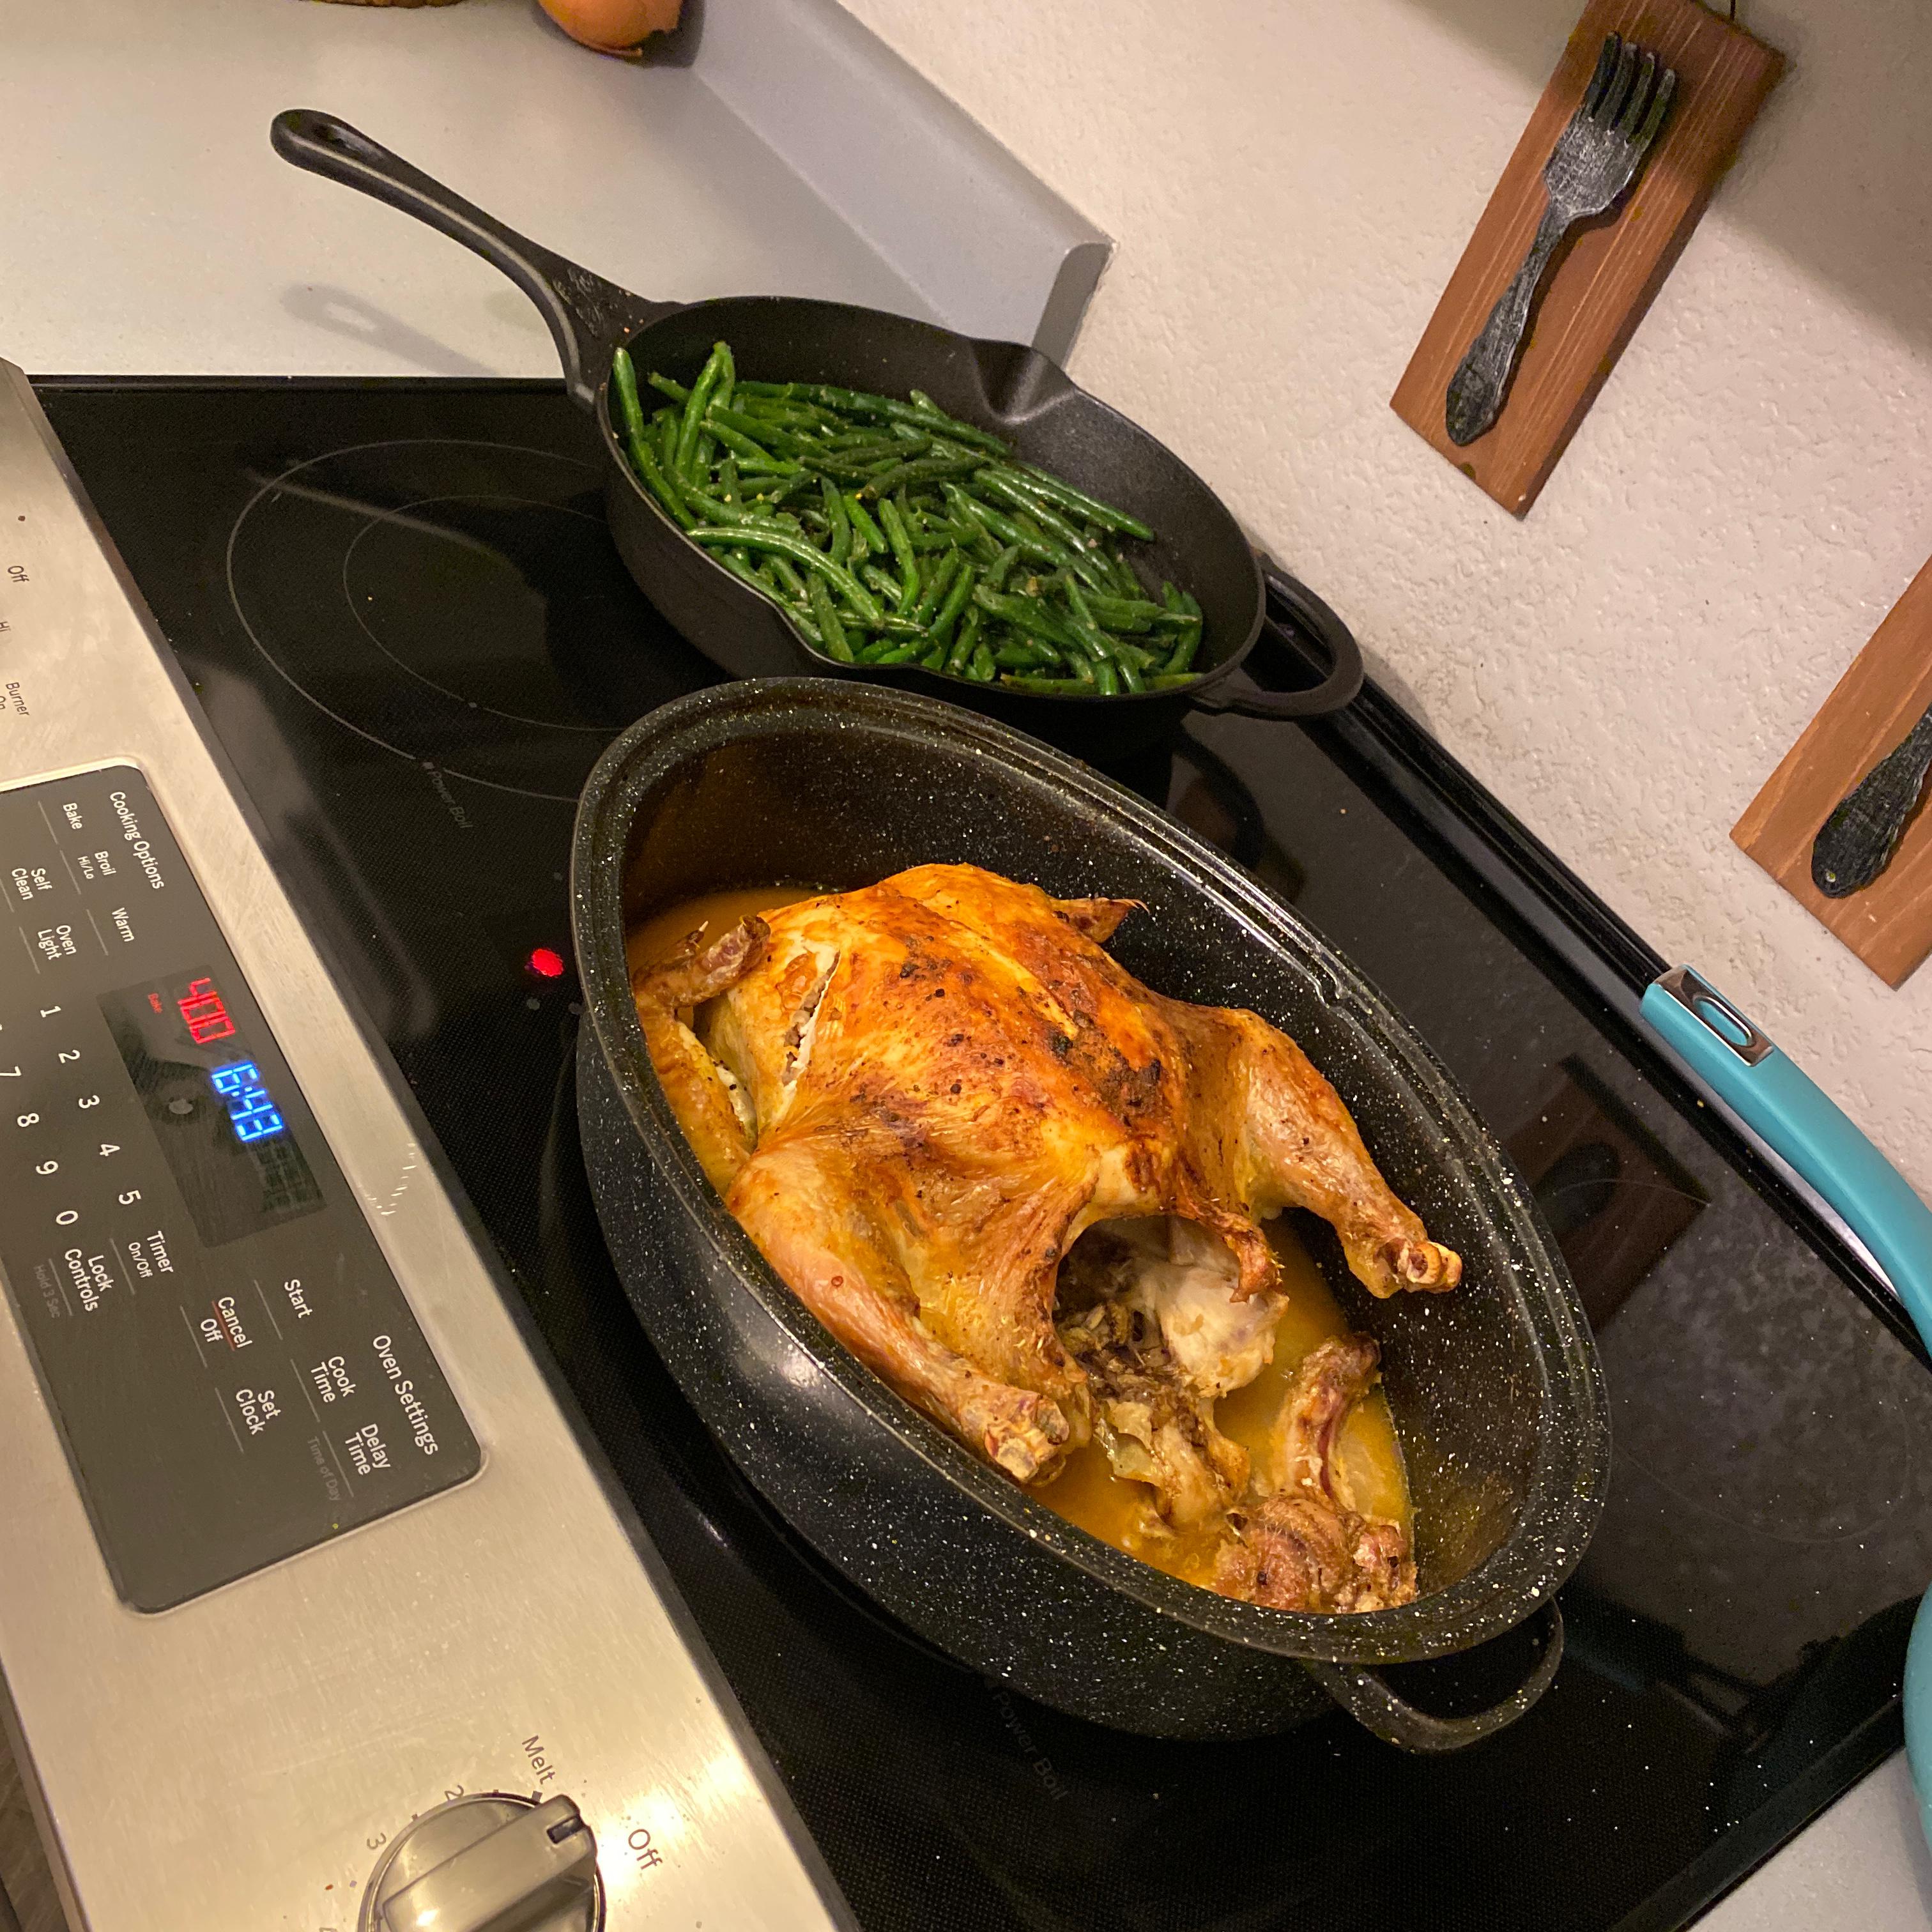 Juicy Roasted Chicken